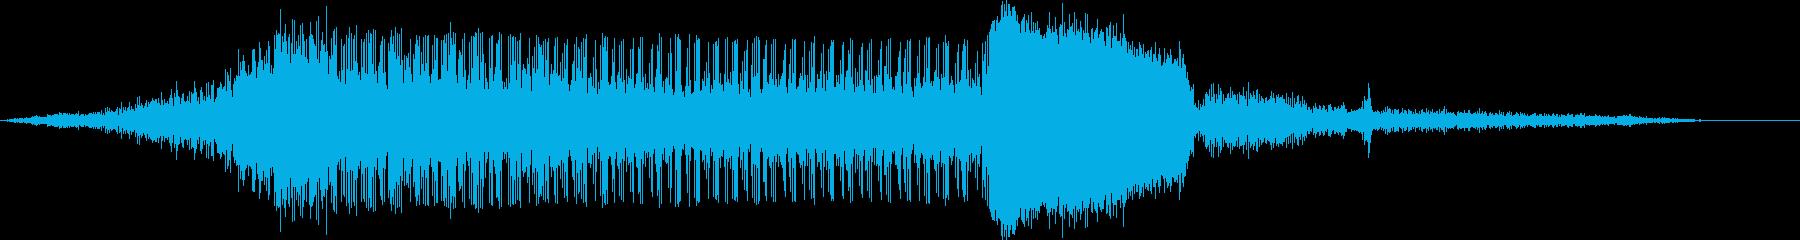 Model-t、In、Idle、A...の再生済みの波形